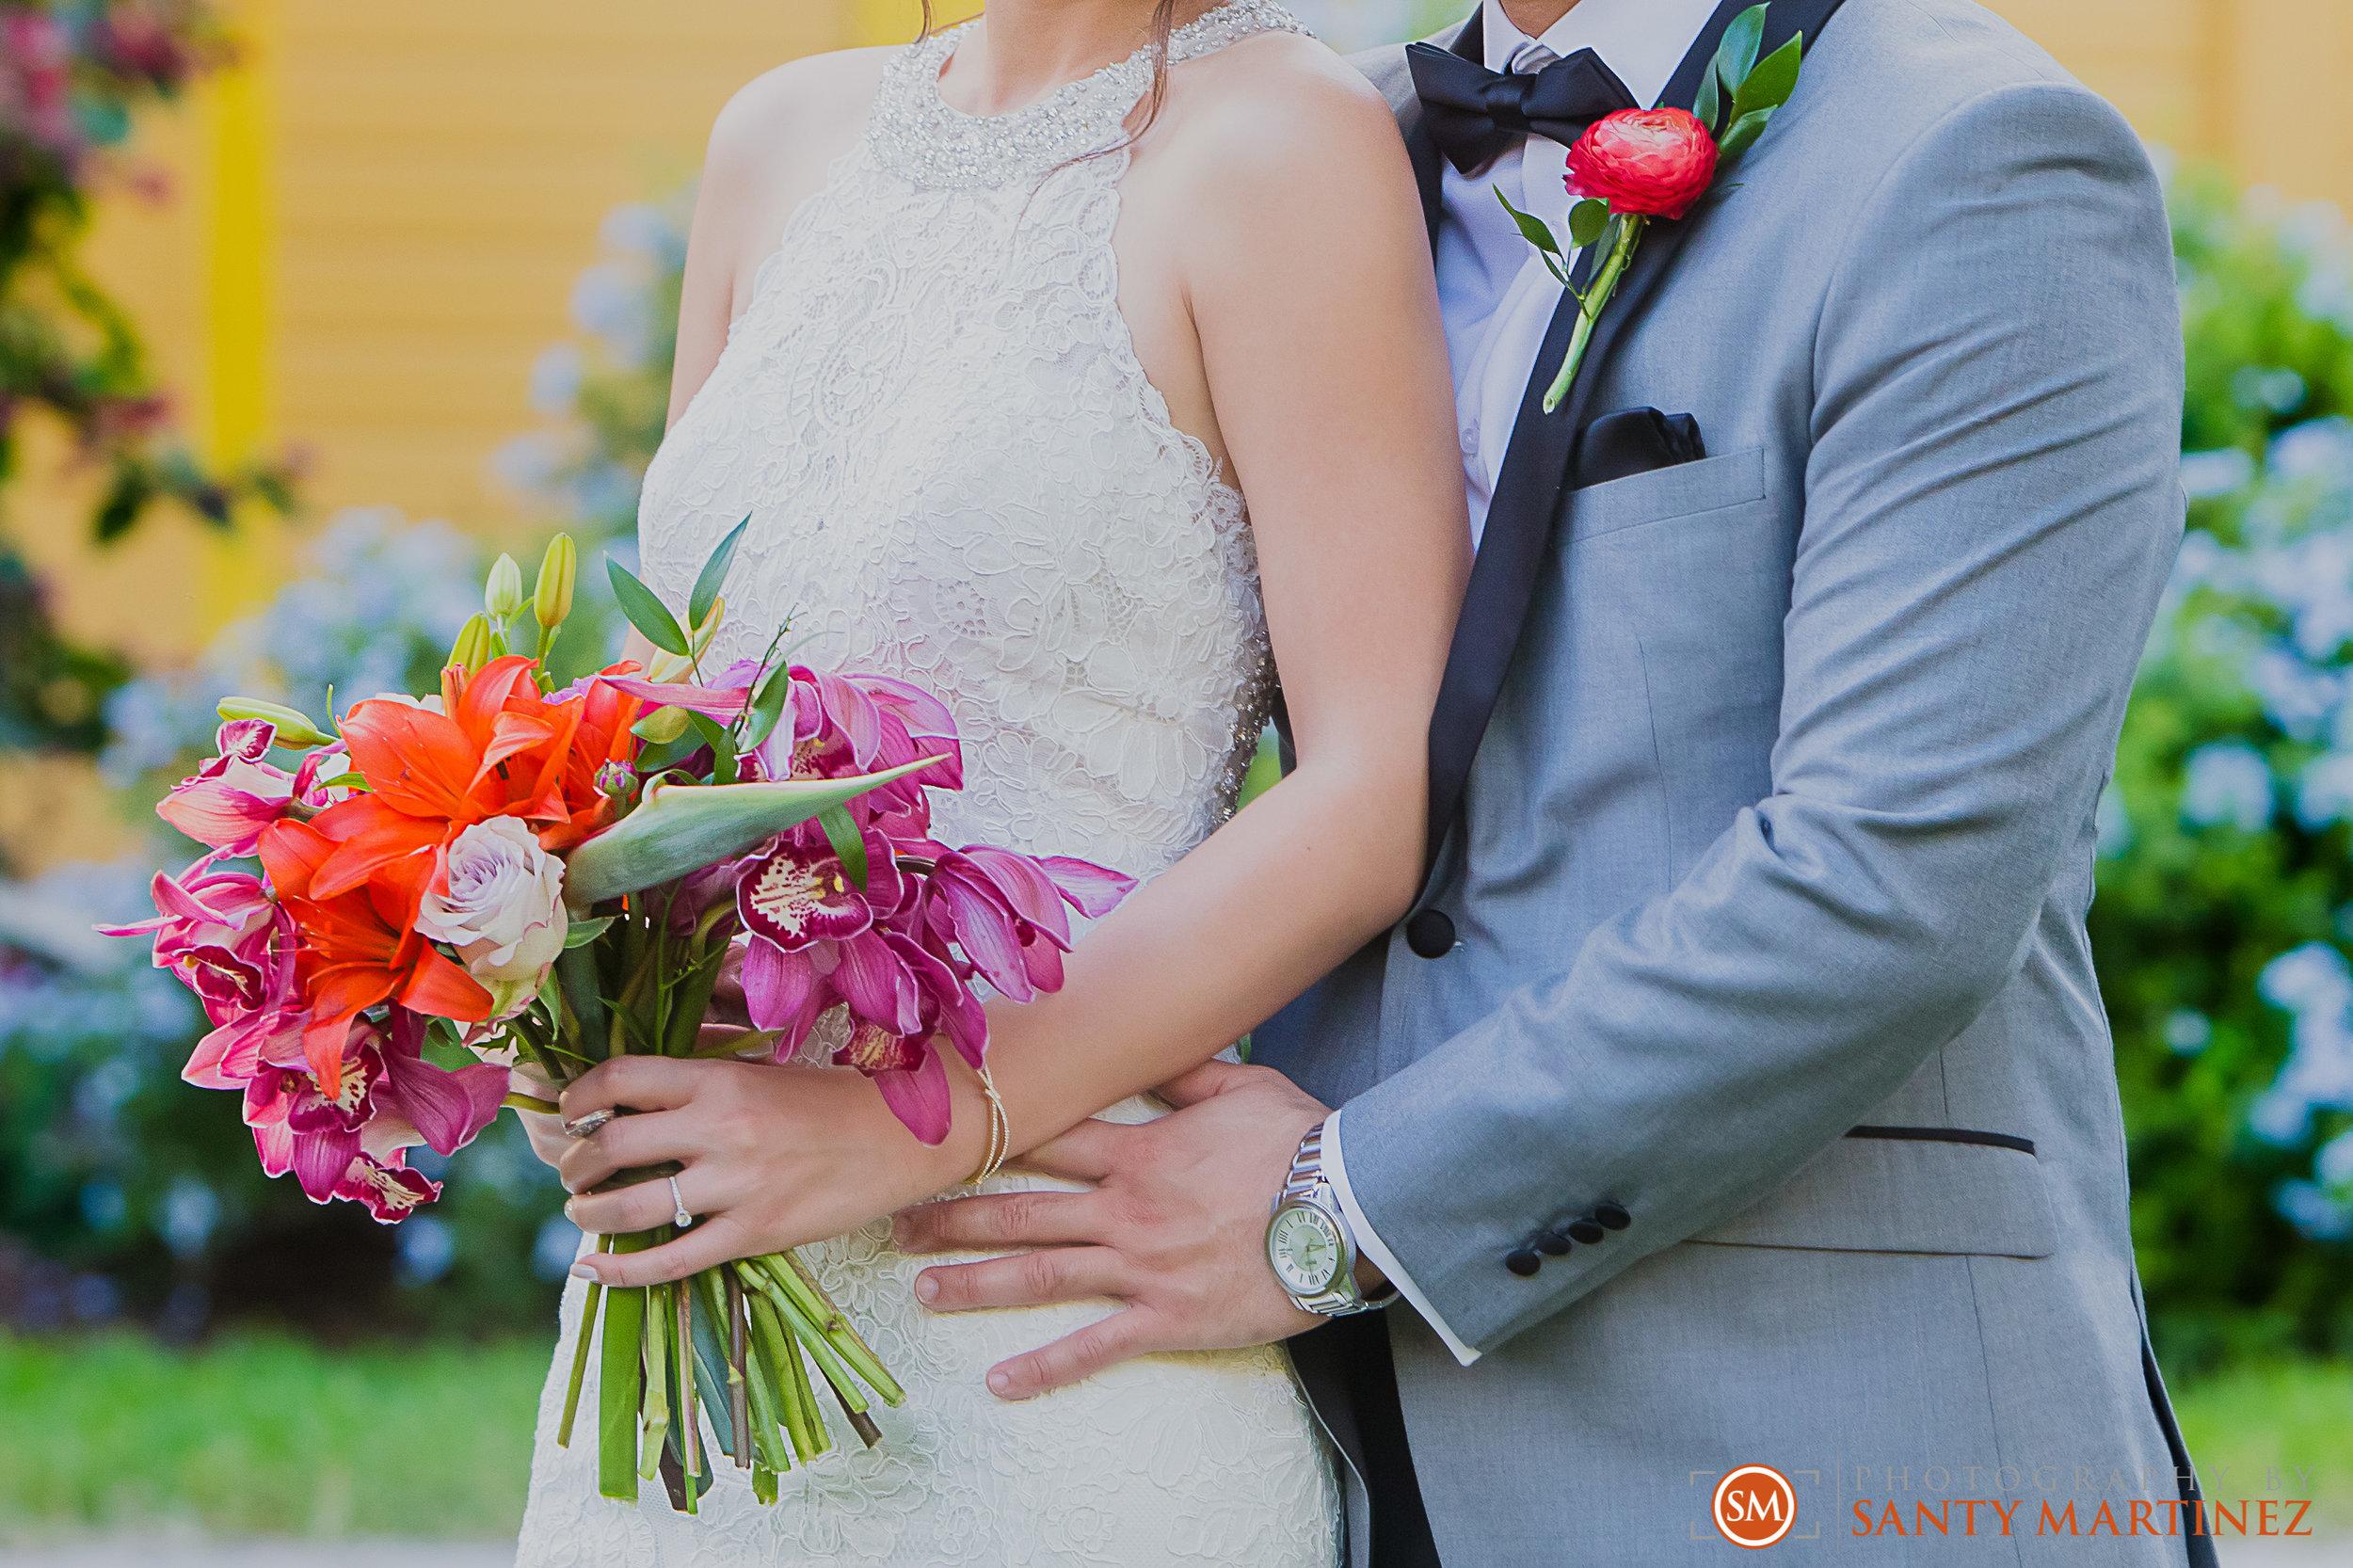 Wedding Bonnet House - Photography by Santy Martinez-18.jpg